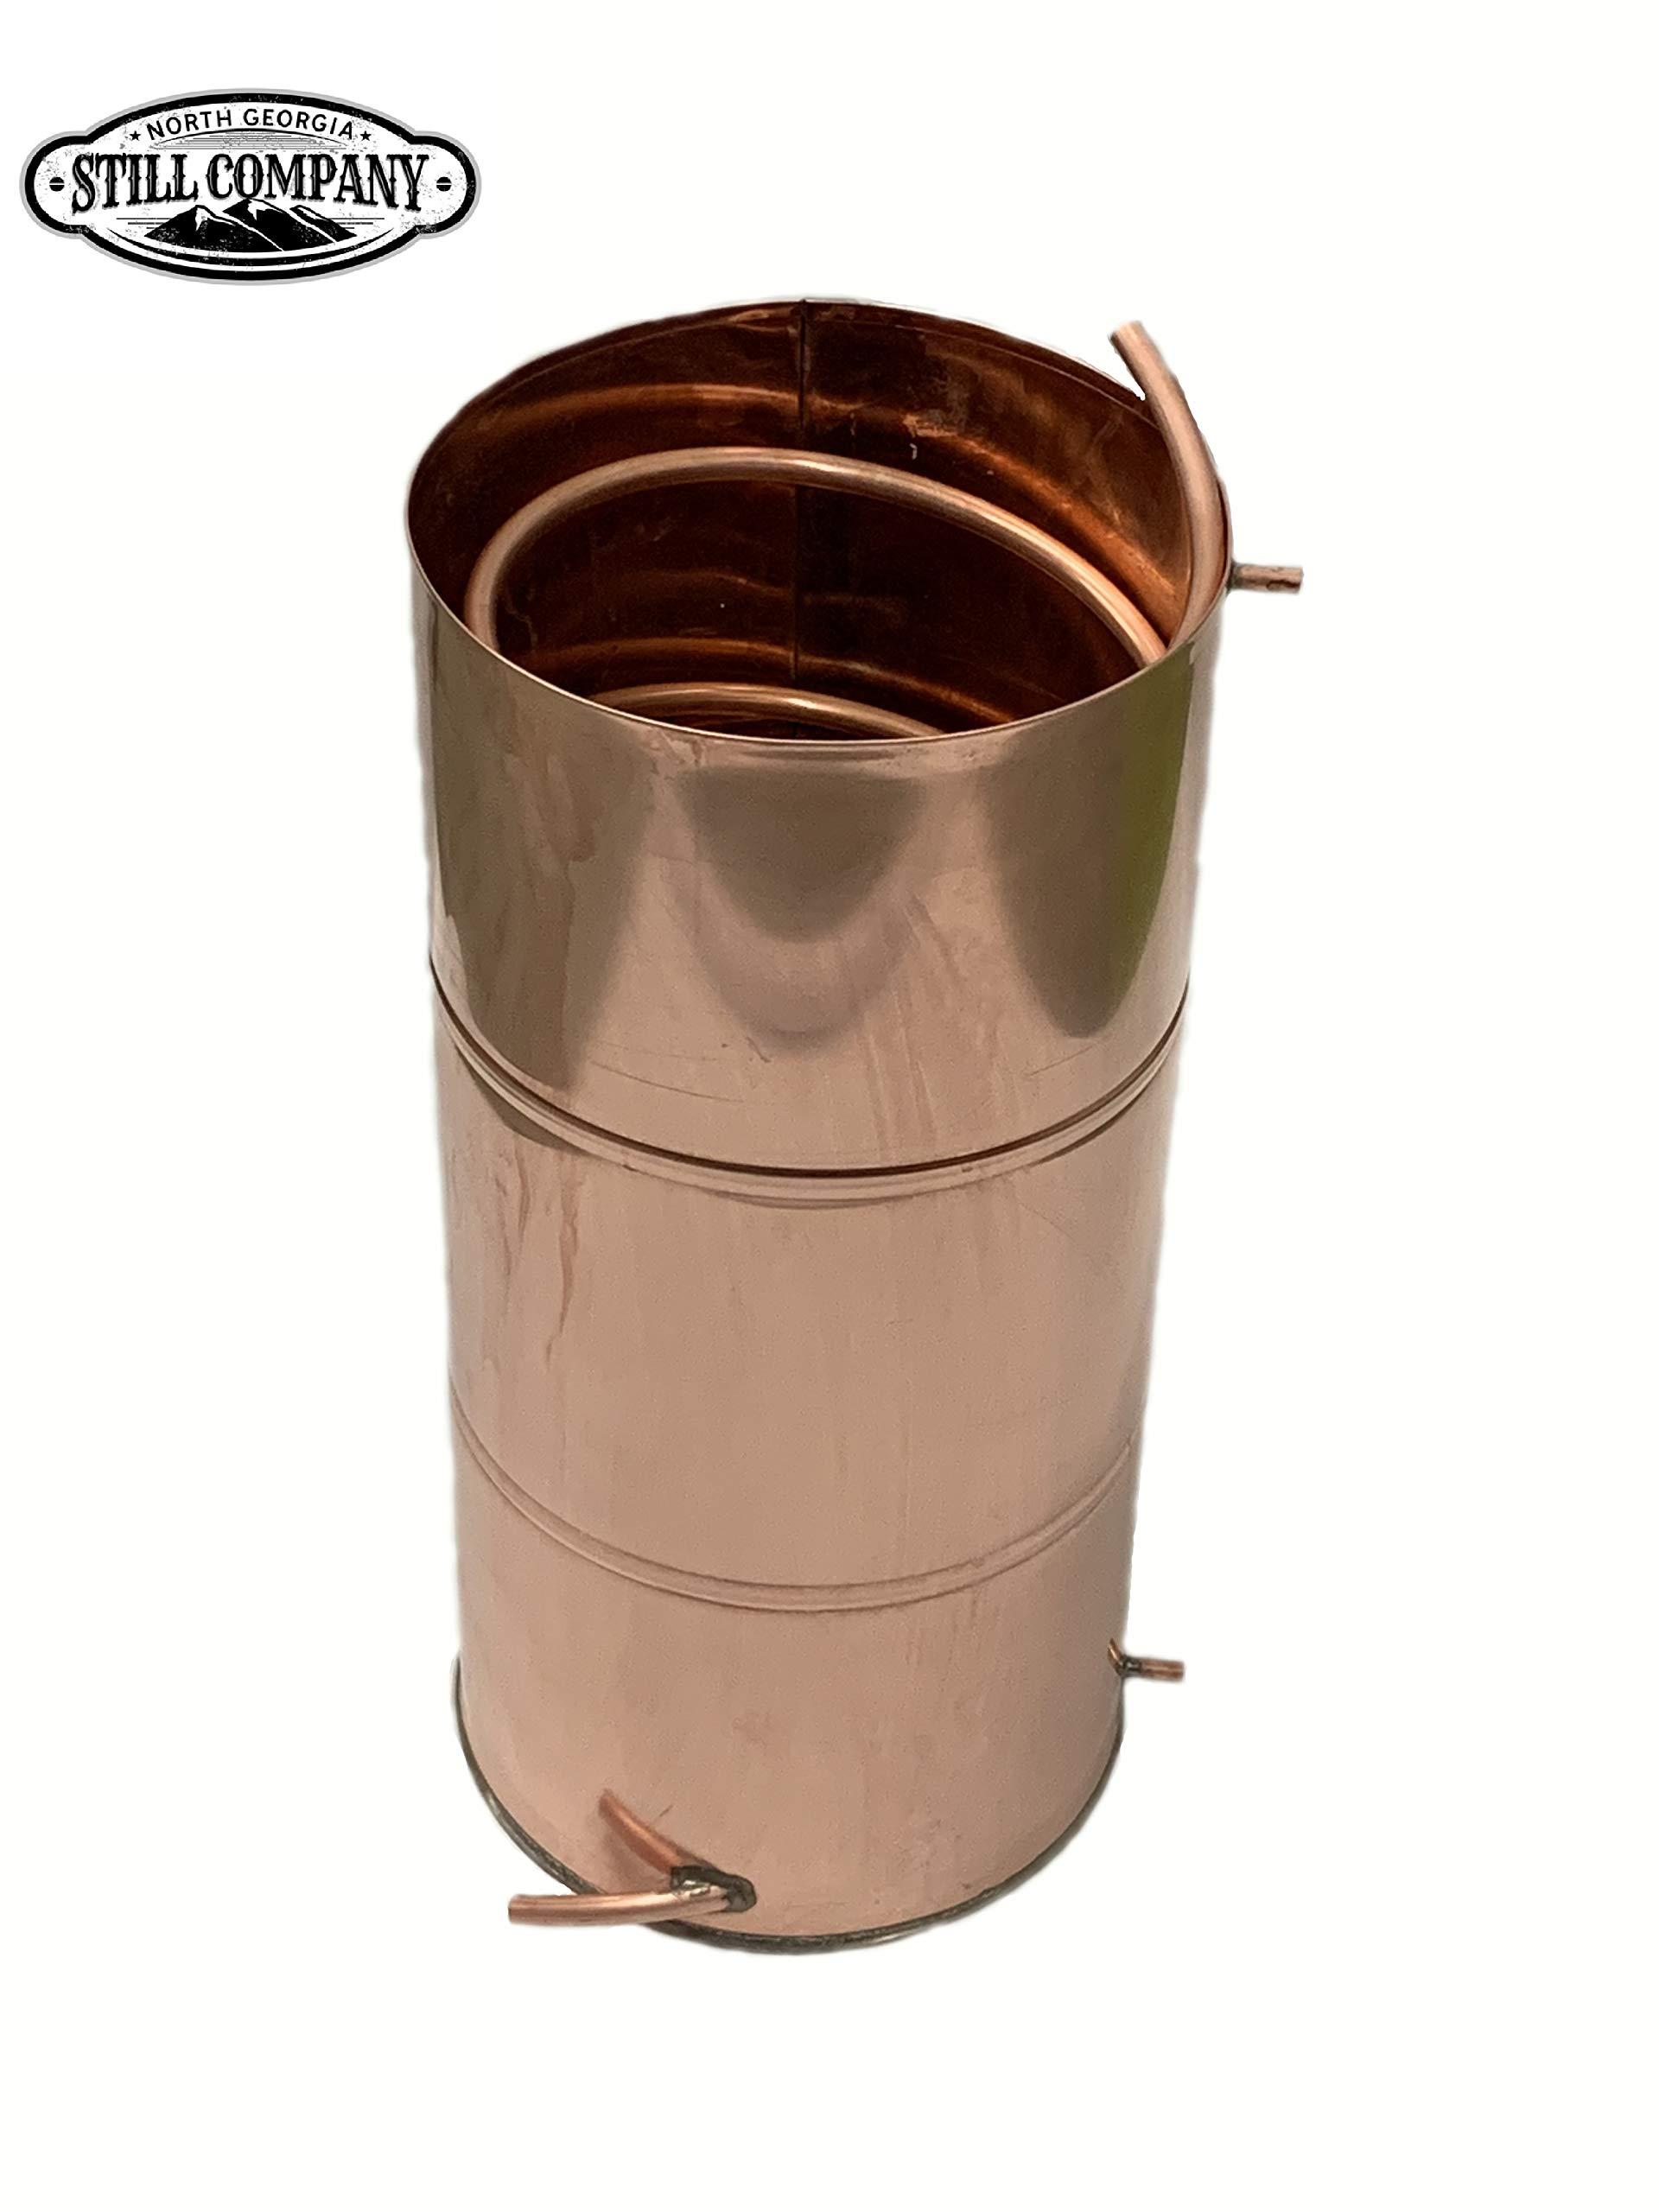 Moonshine Whiskey Still 10 Gallon Worm Condenser, 1/2 OD Coil by North Georgia Still Company by North Georgia Still Company (Image #5)